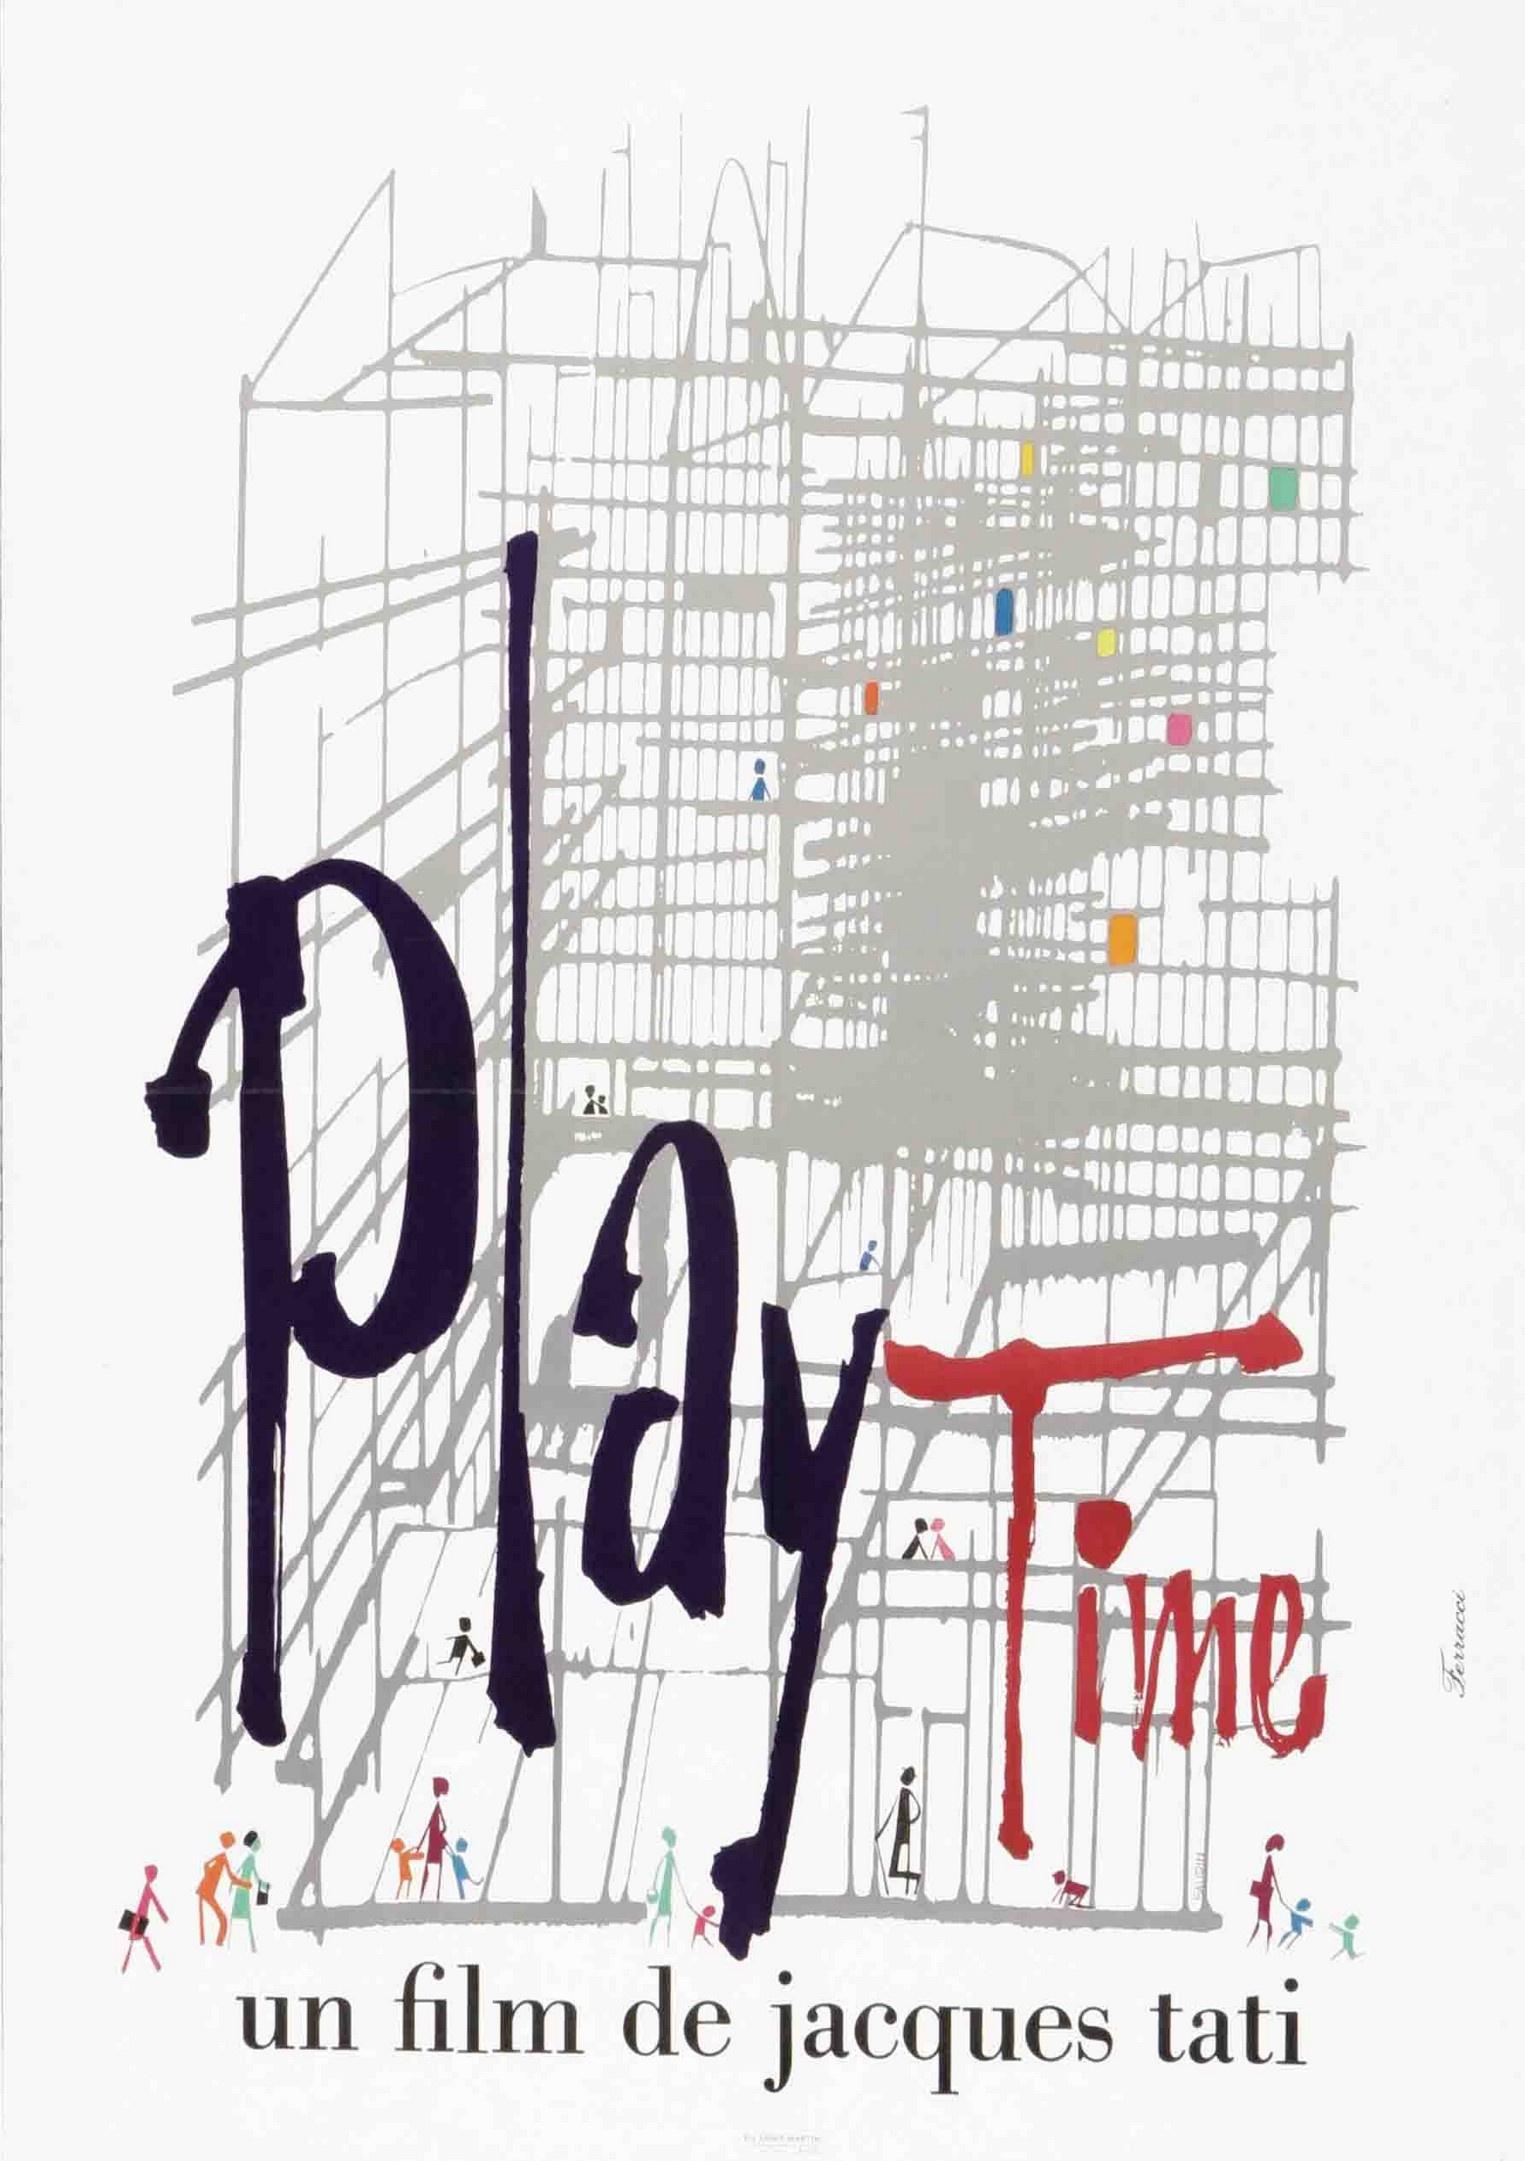 playtime de jacques tati 1967 analyse et critique du film dvdclassik. Black Bedroom Furniture Sets. Home Design Ideas